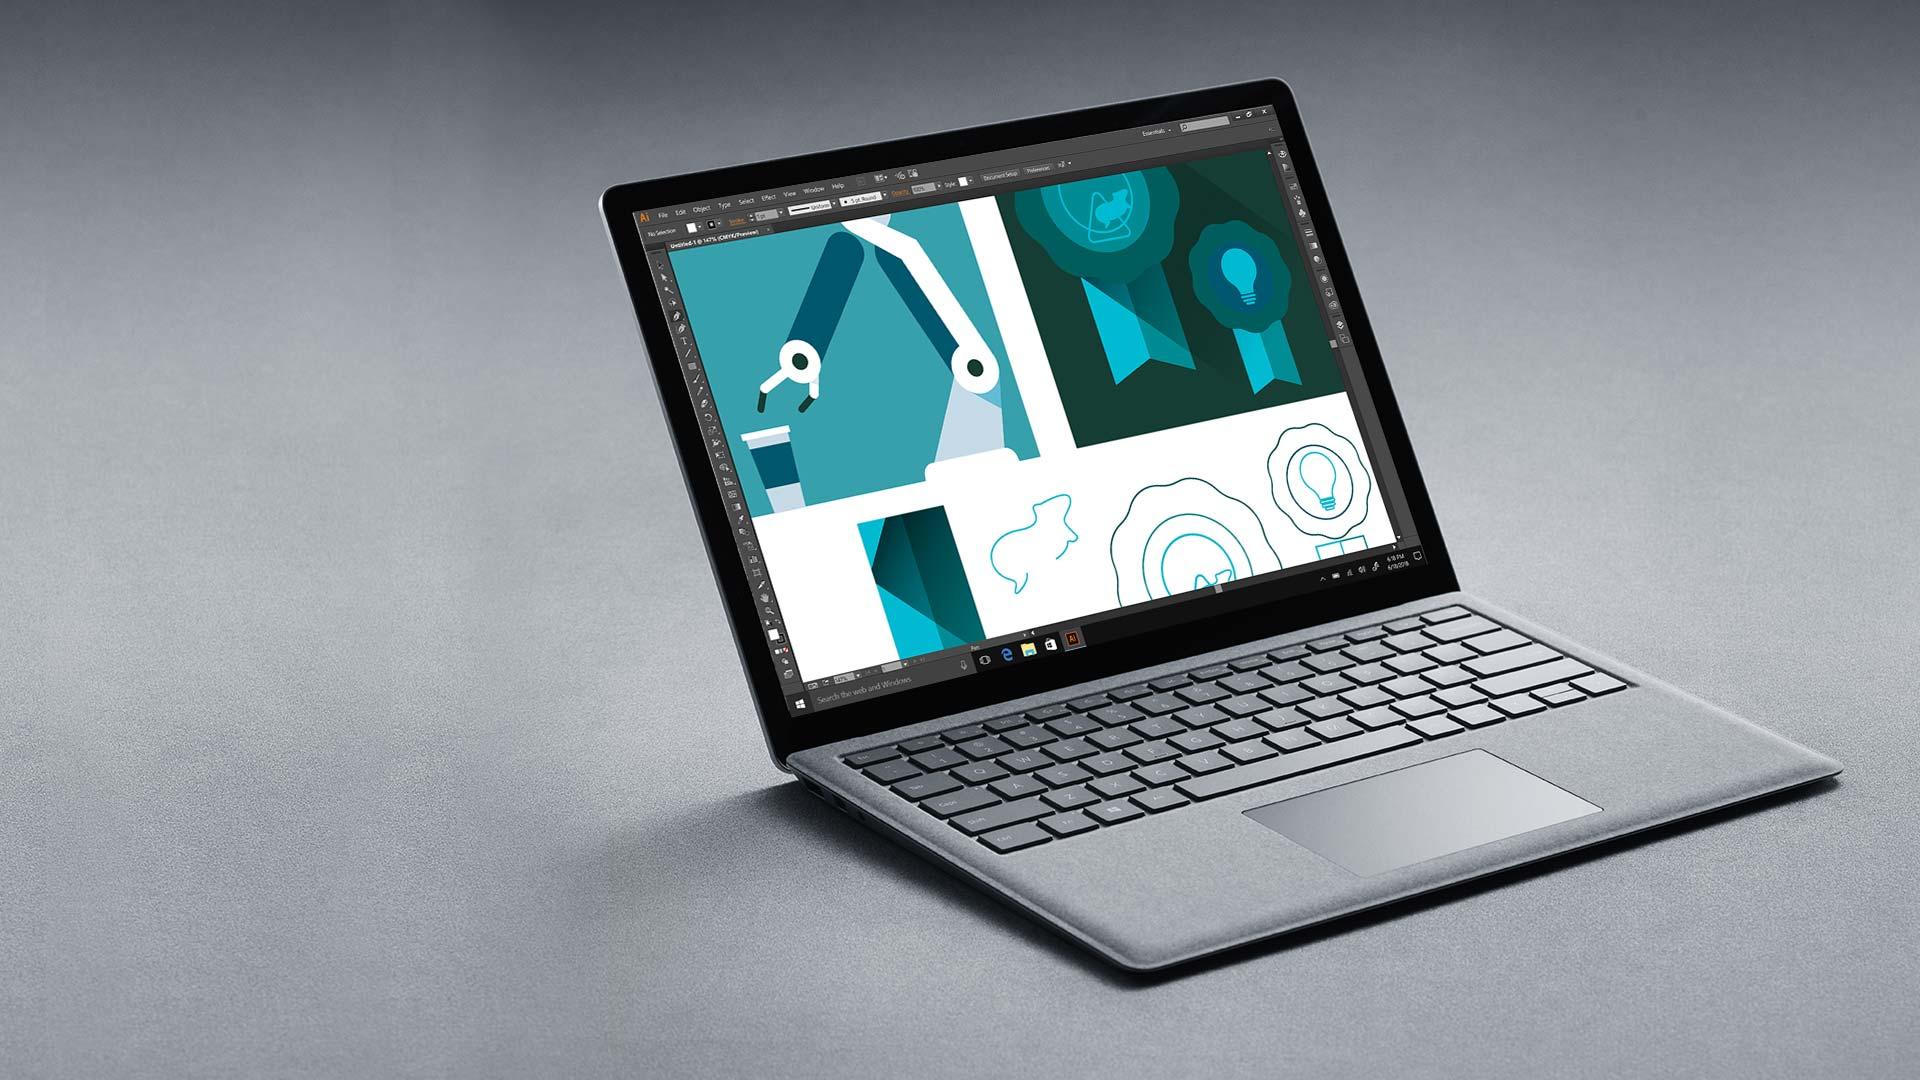 Adobe Illustrator を画面に表示したプラチナの Surface Laptop。